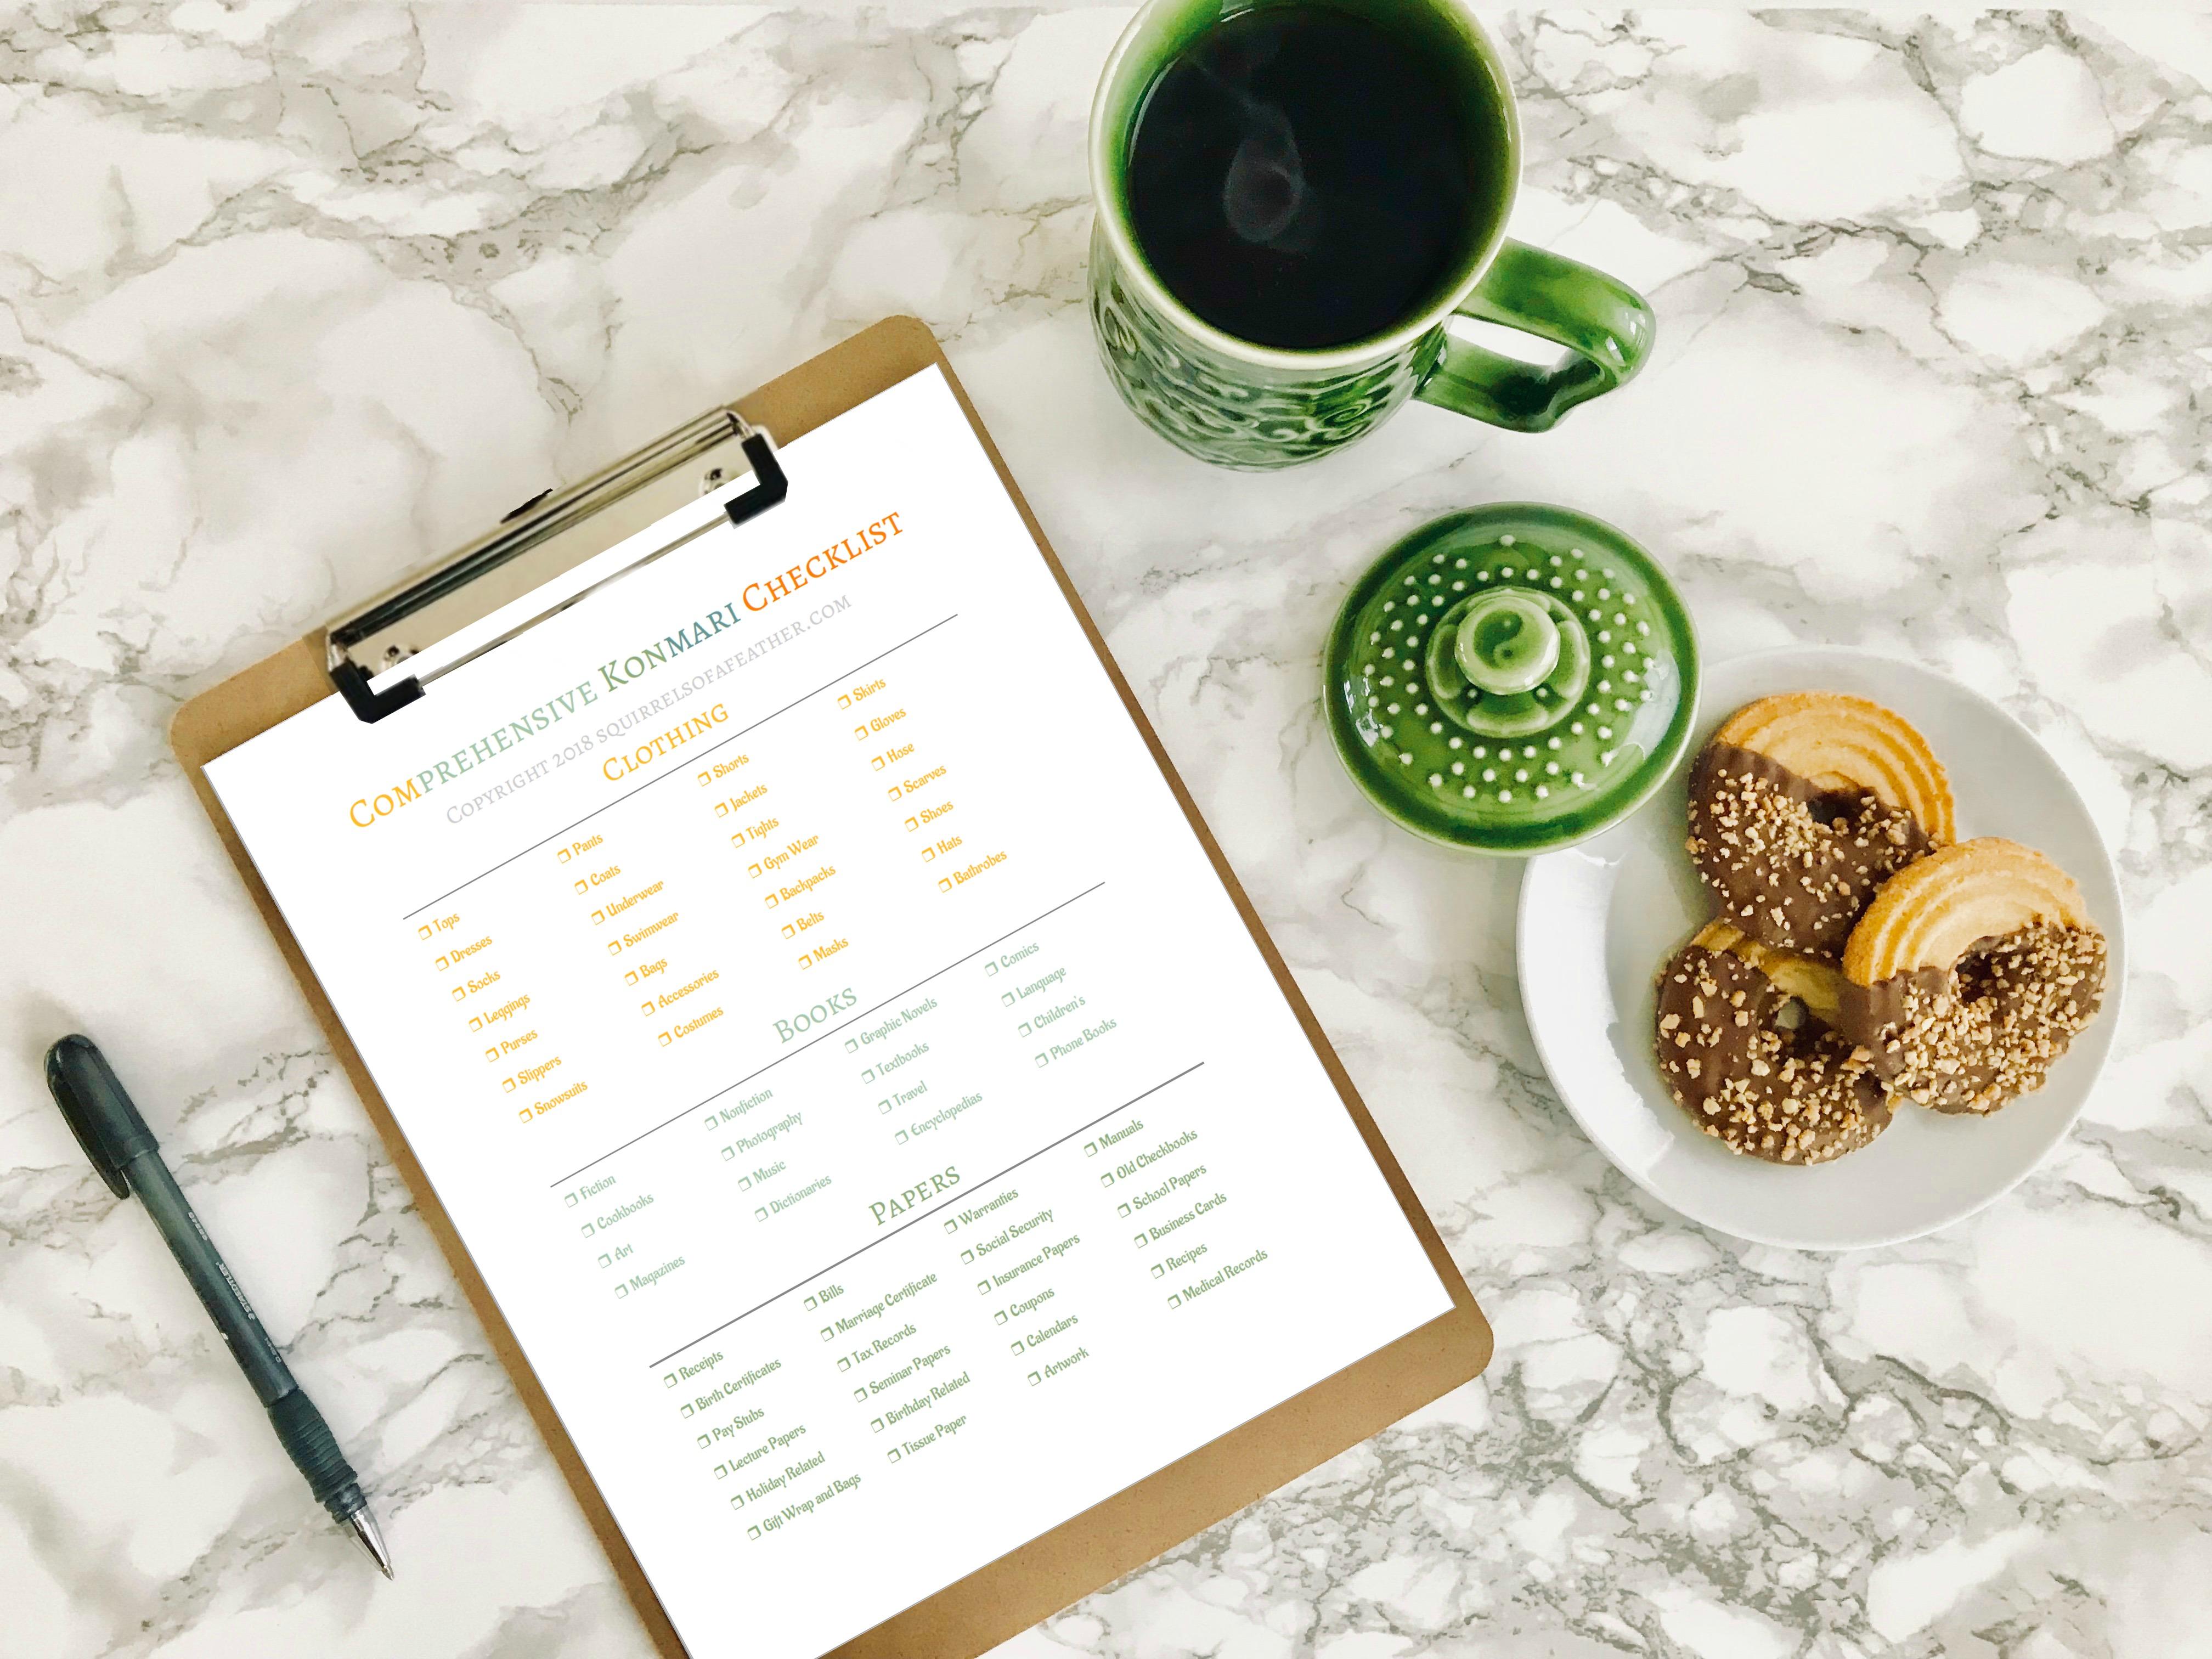 the ultimate free comprehensive konmari checklist 5 page printable